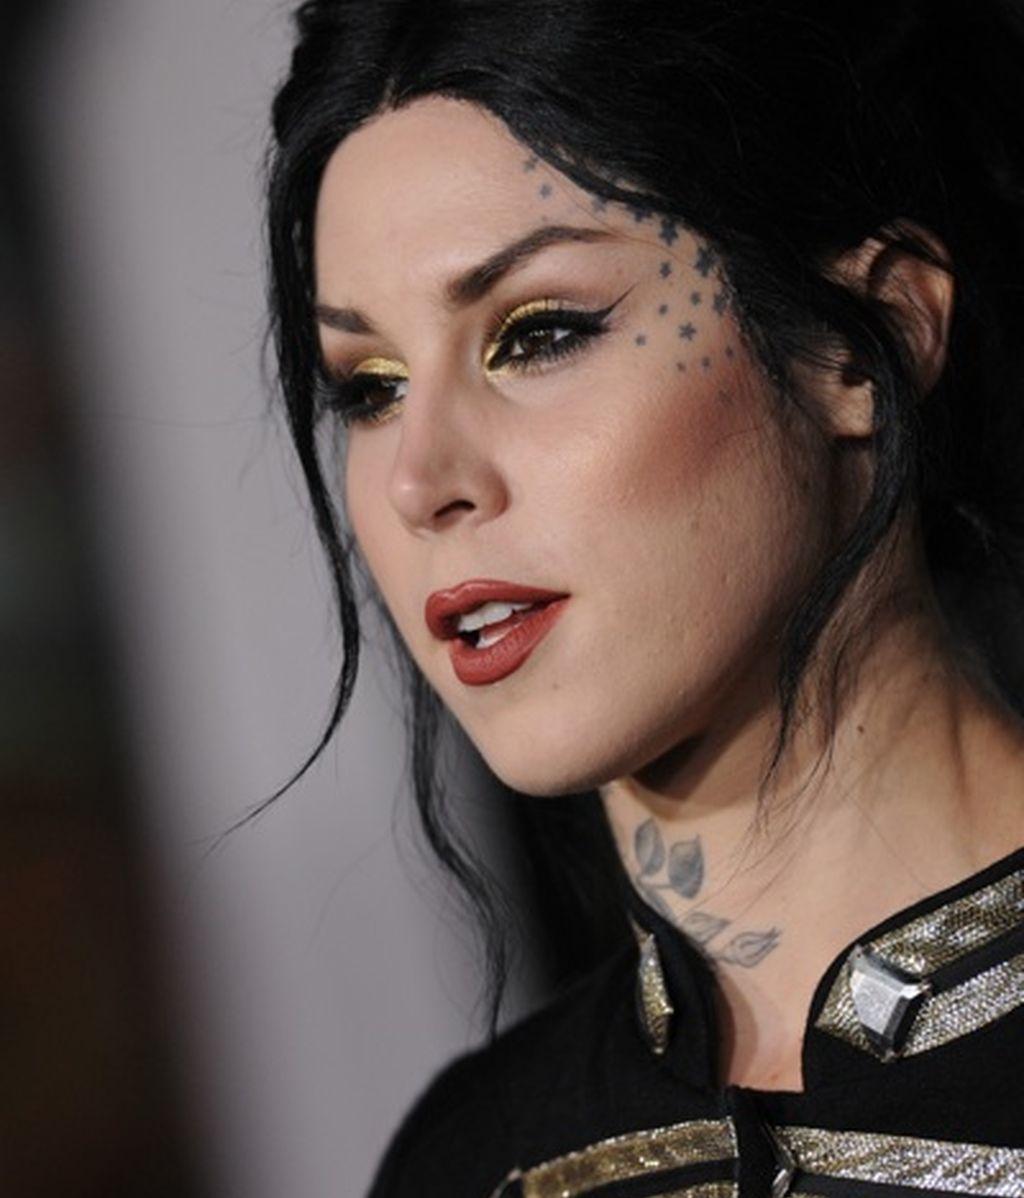 Top forever: mejores y peores tatuajes de celebrities